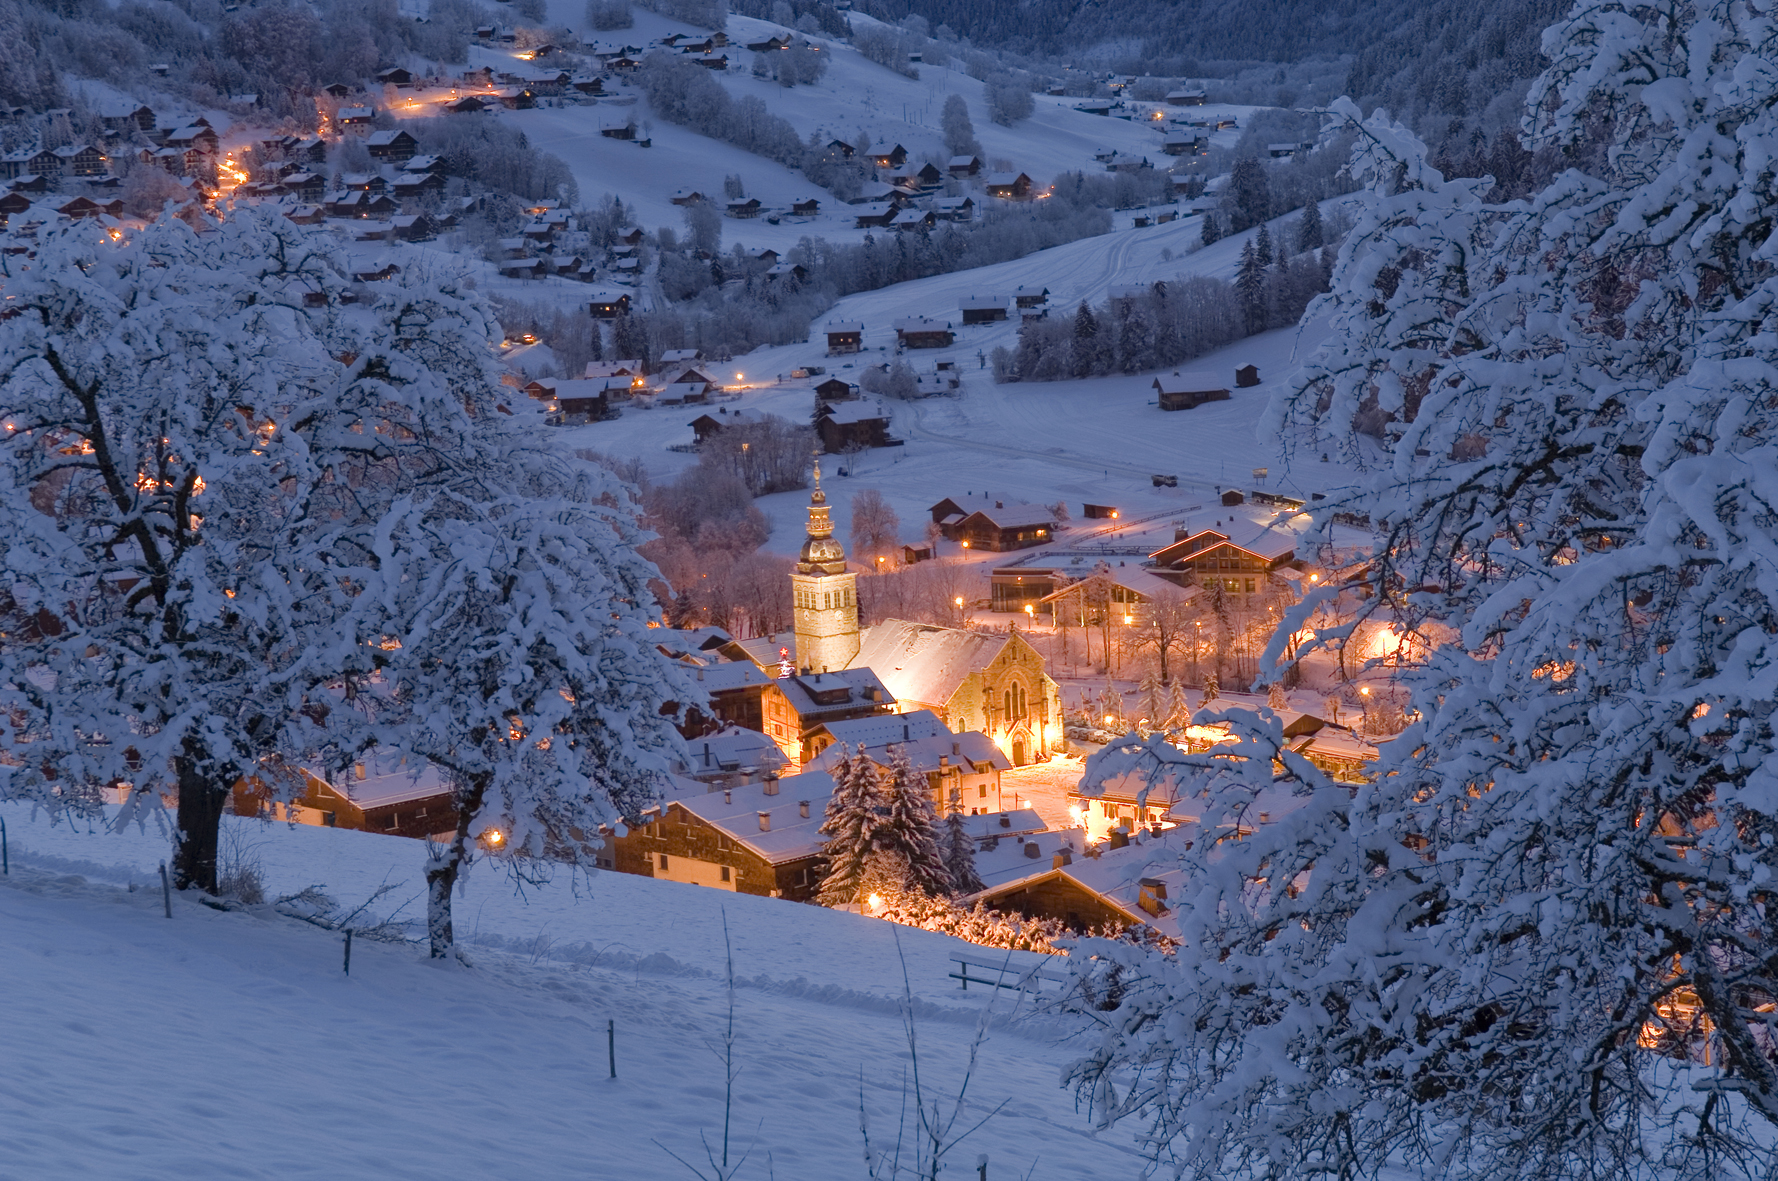 Le Grand Bornand Skiing Holidays Ski Apartments Peak Retreats